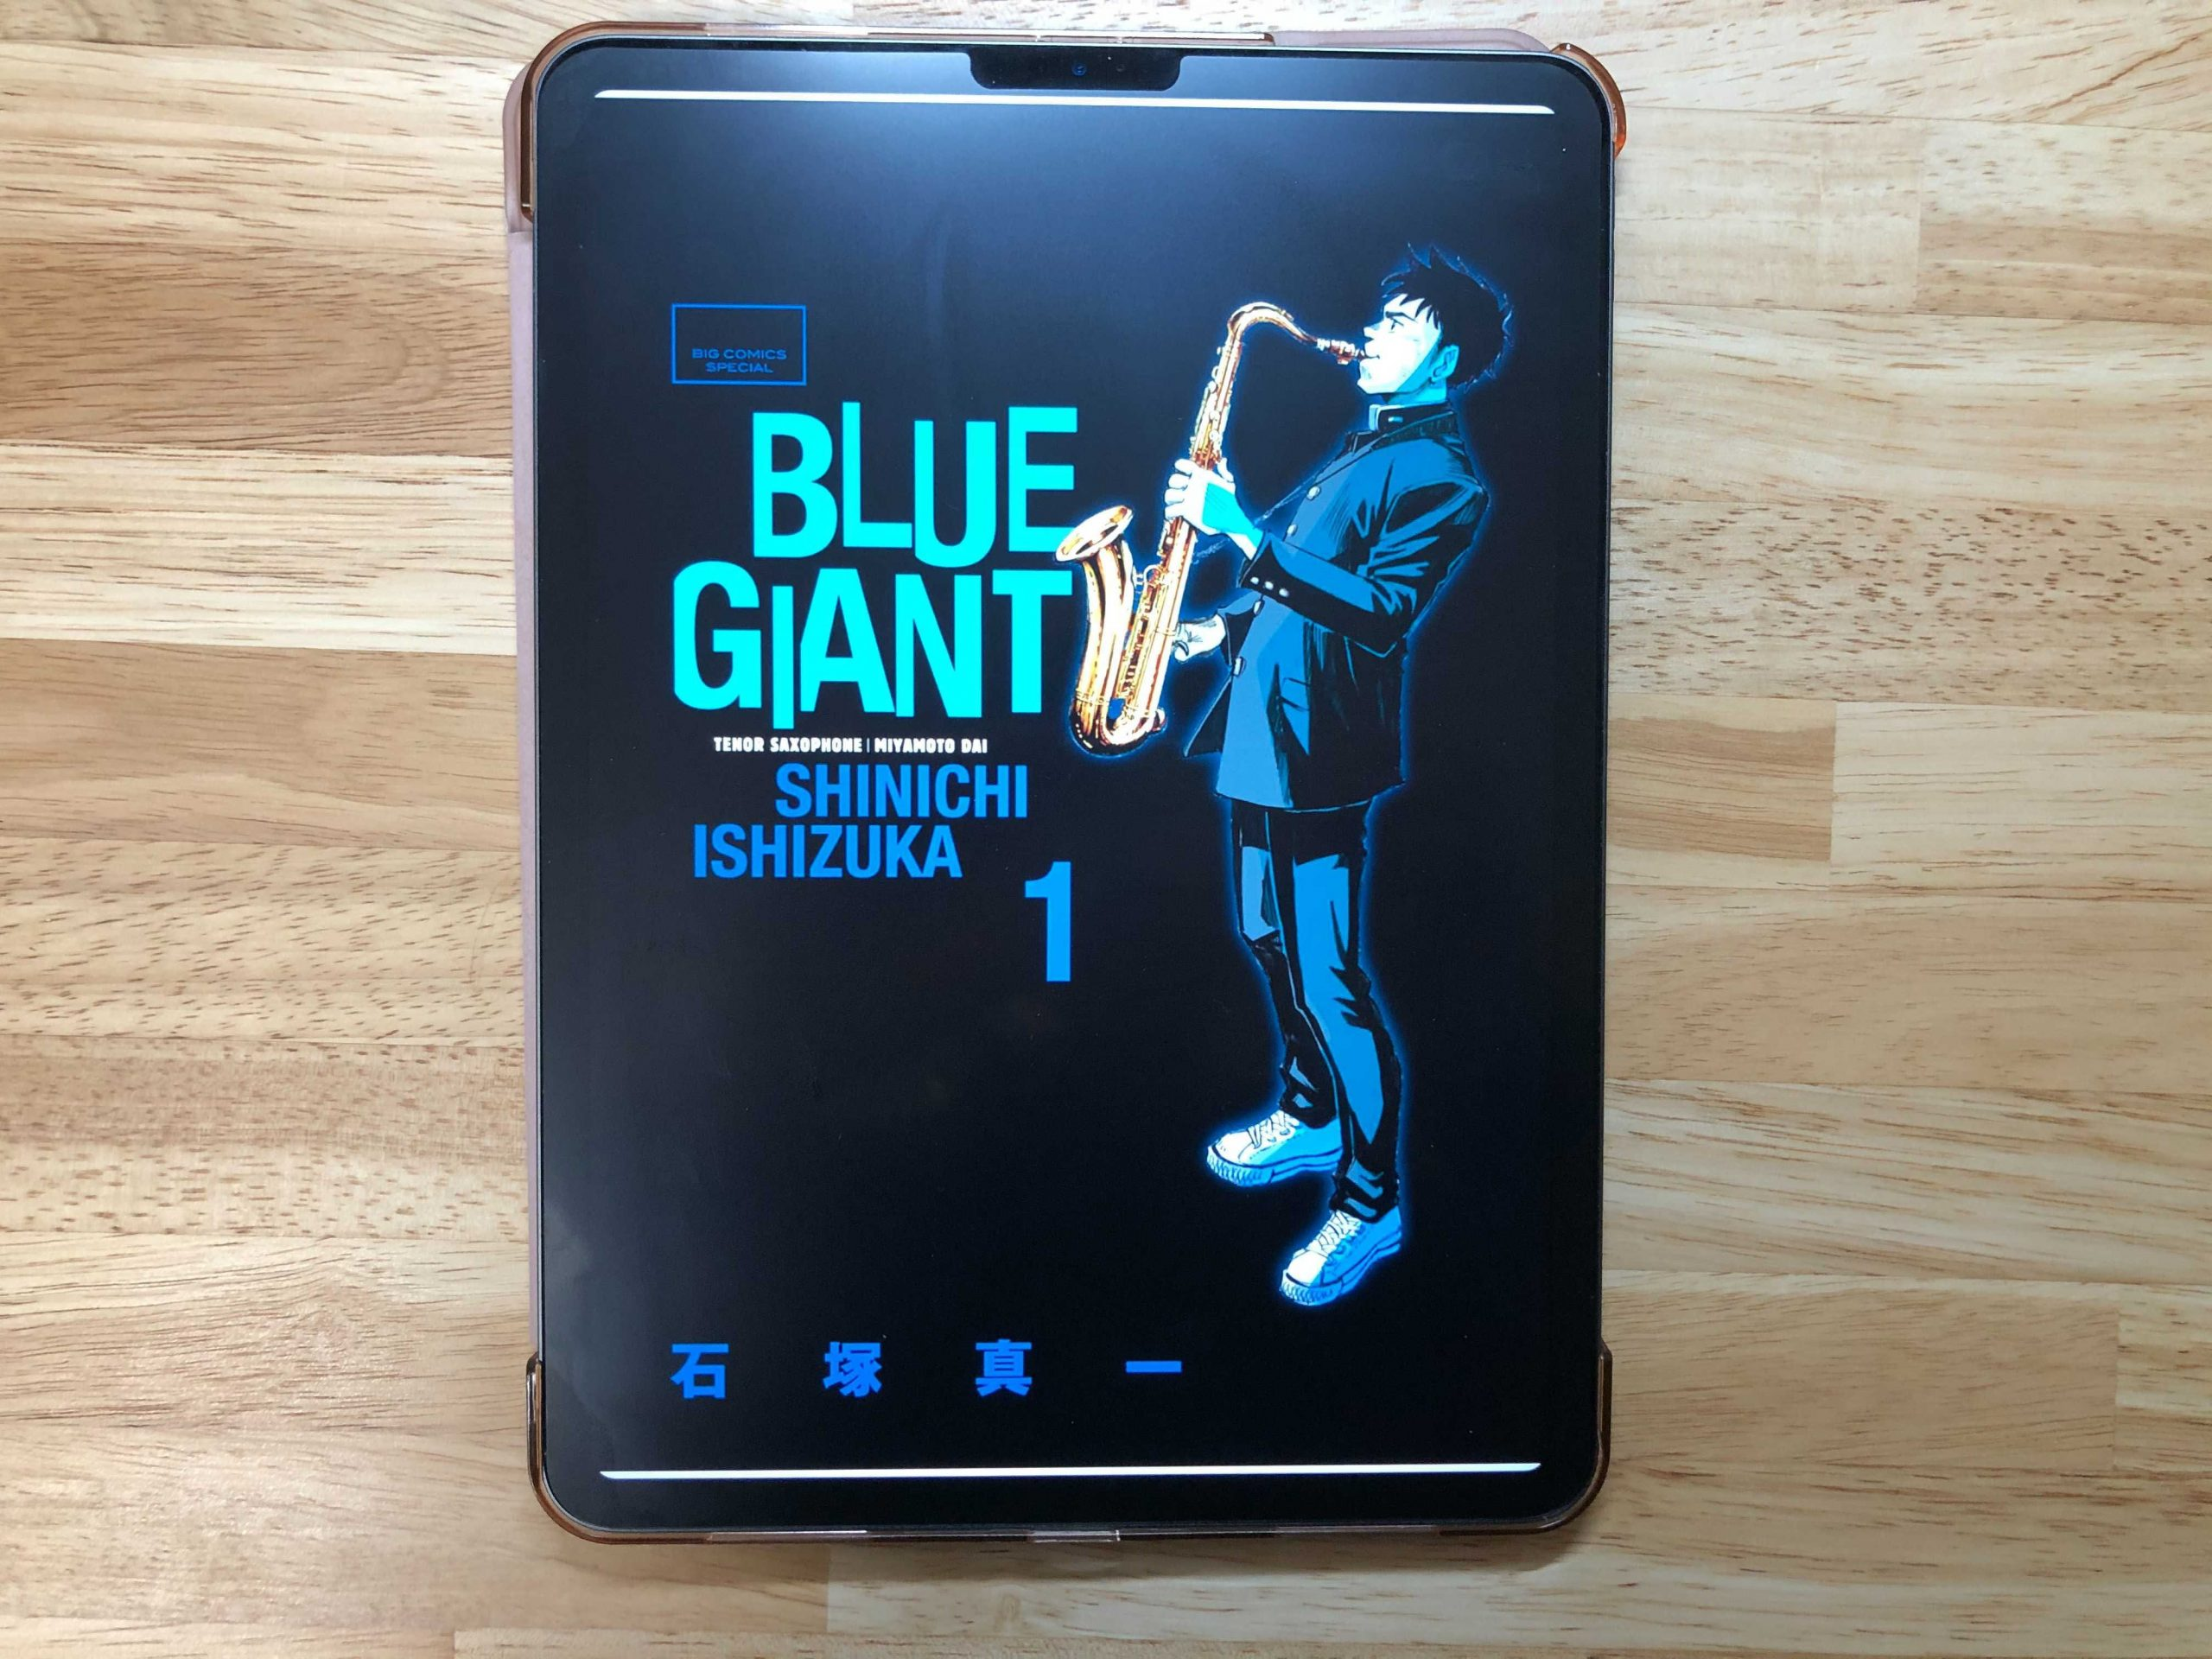 『BLUE GIANT』